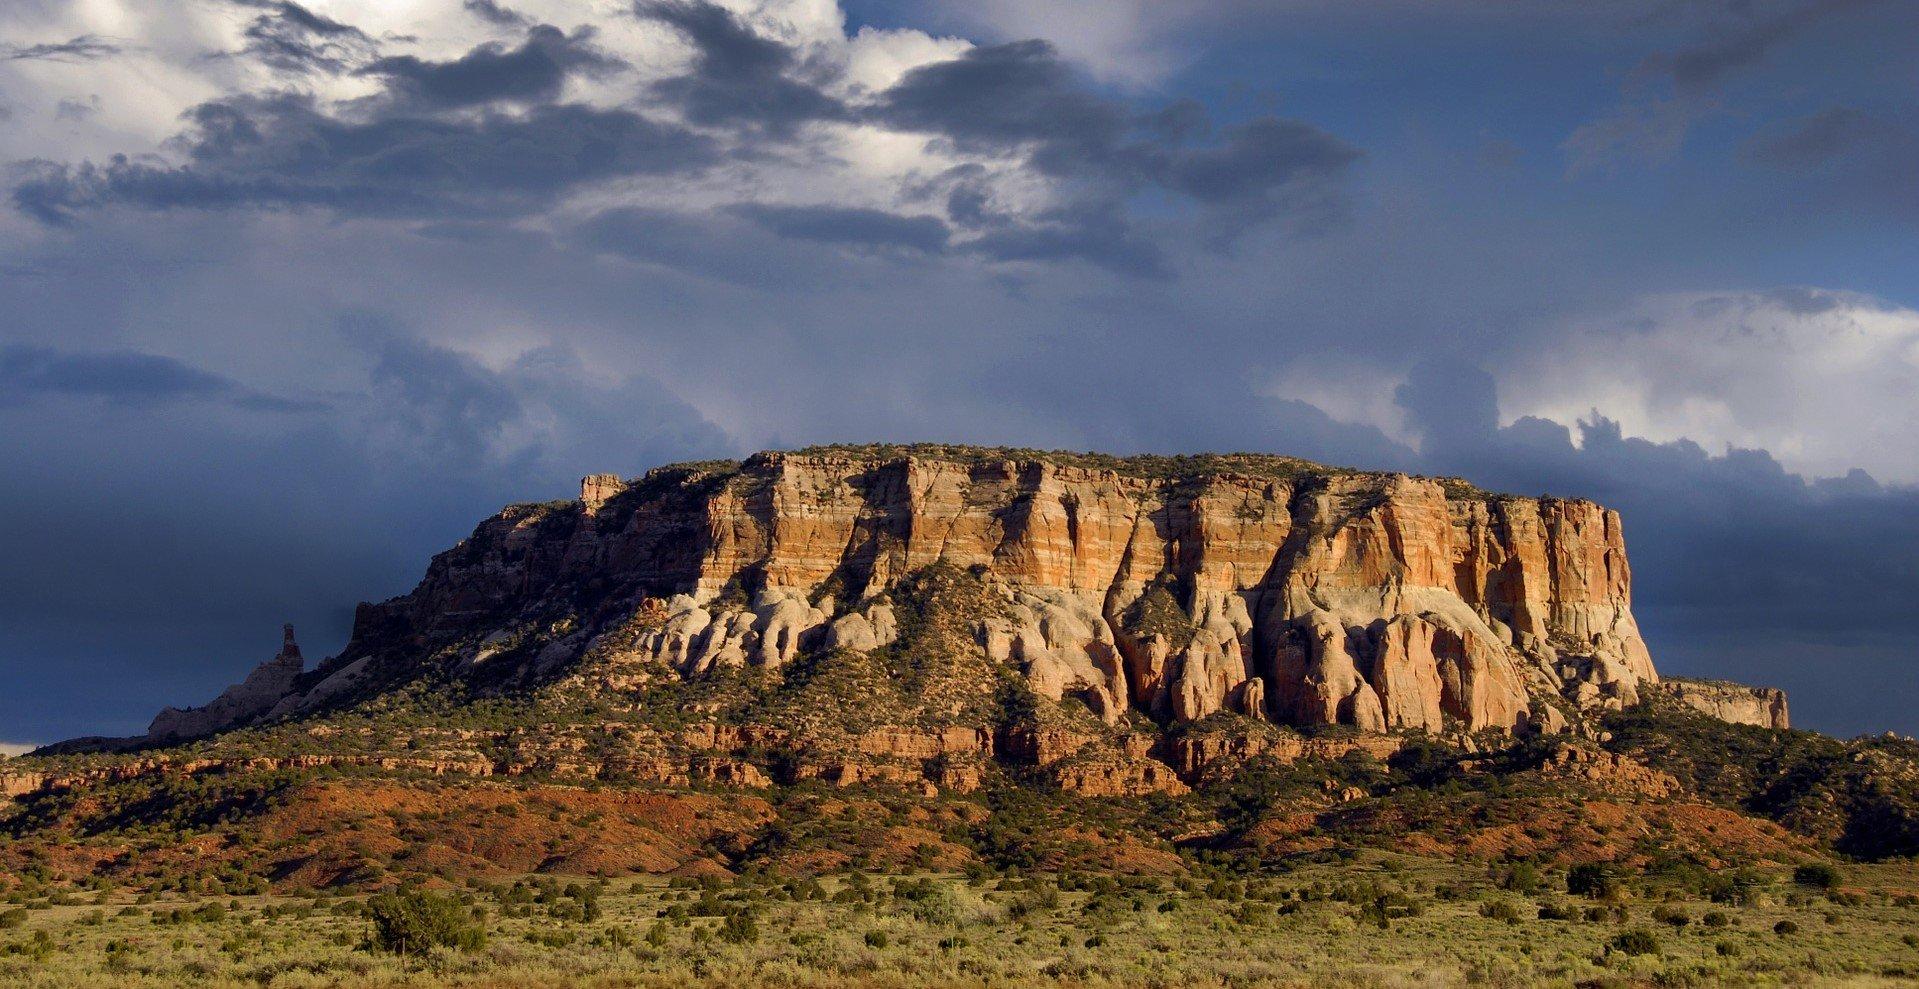 Desert Mesa in New Mexico - VeteranCarDonations.org